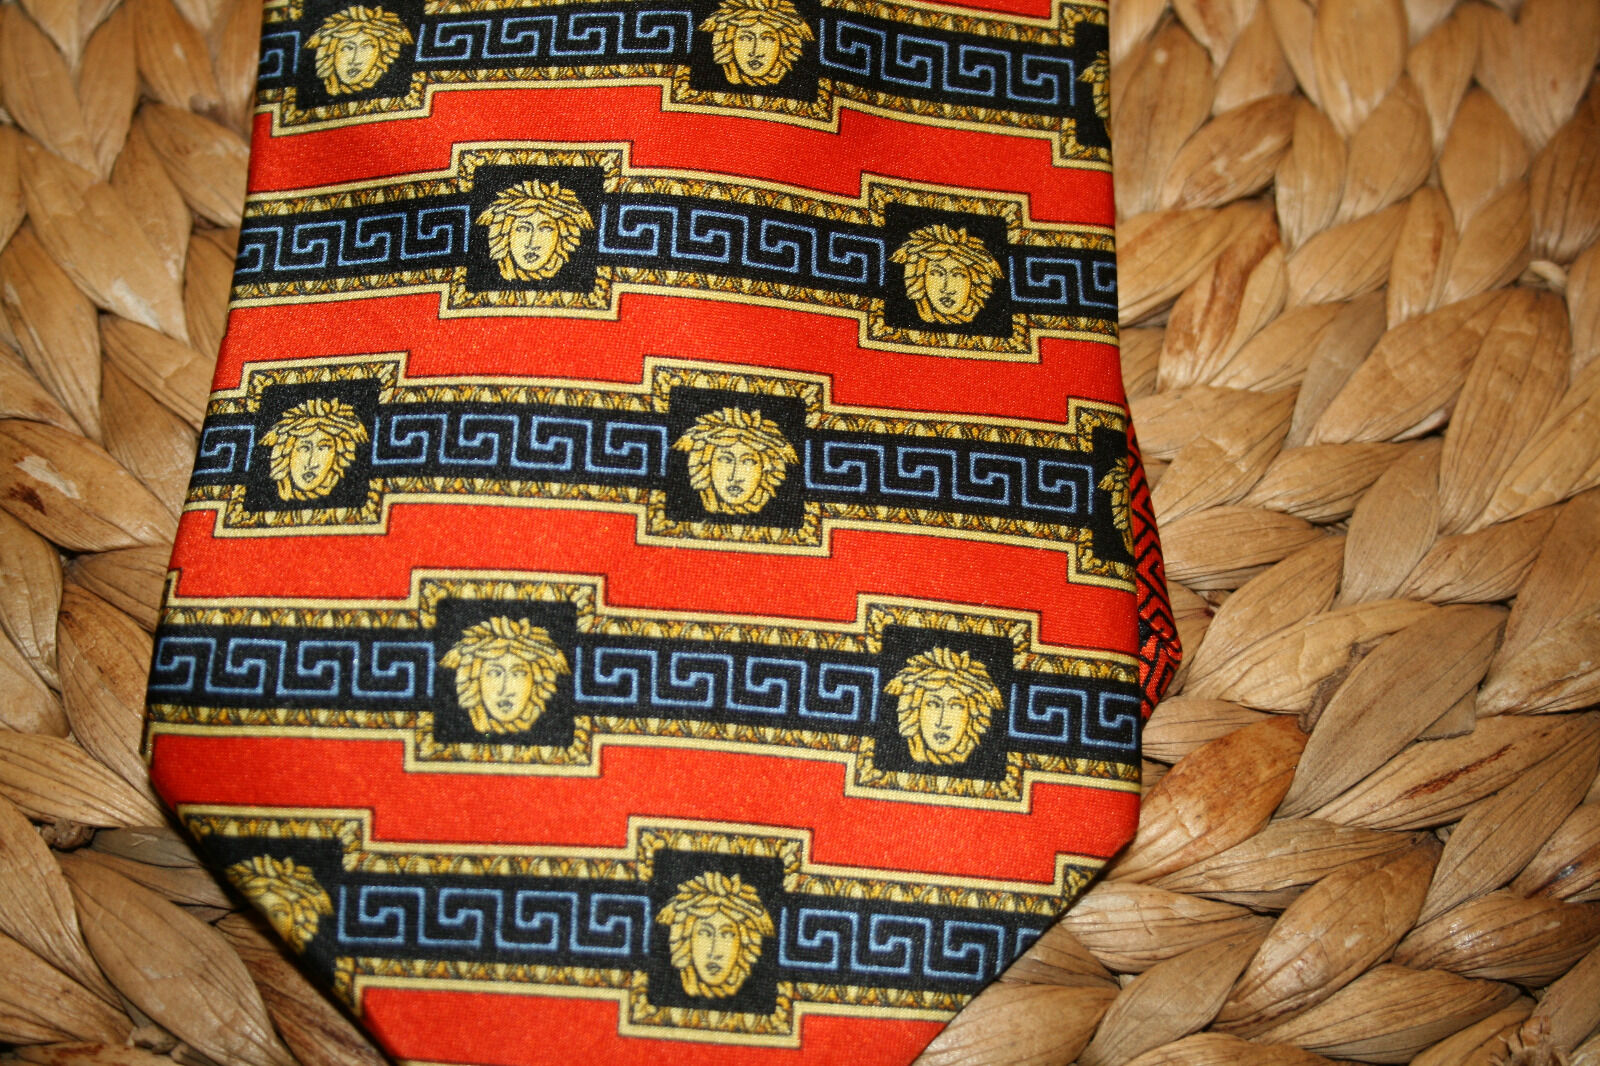 Krawatte von Versace Versace Versace 1x getragen wie neu     | Bunt,  e5f84c